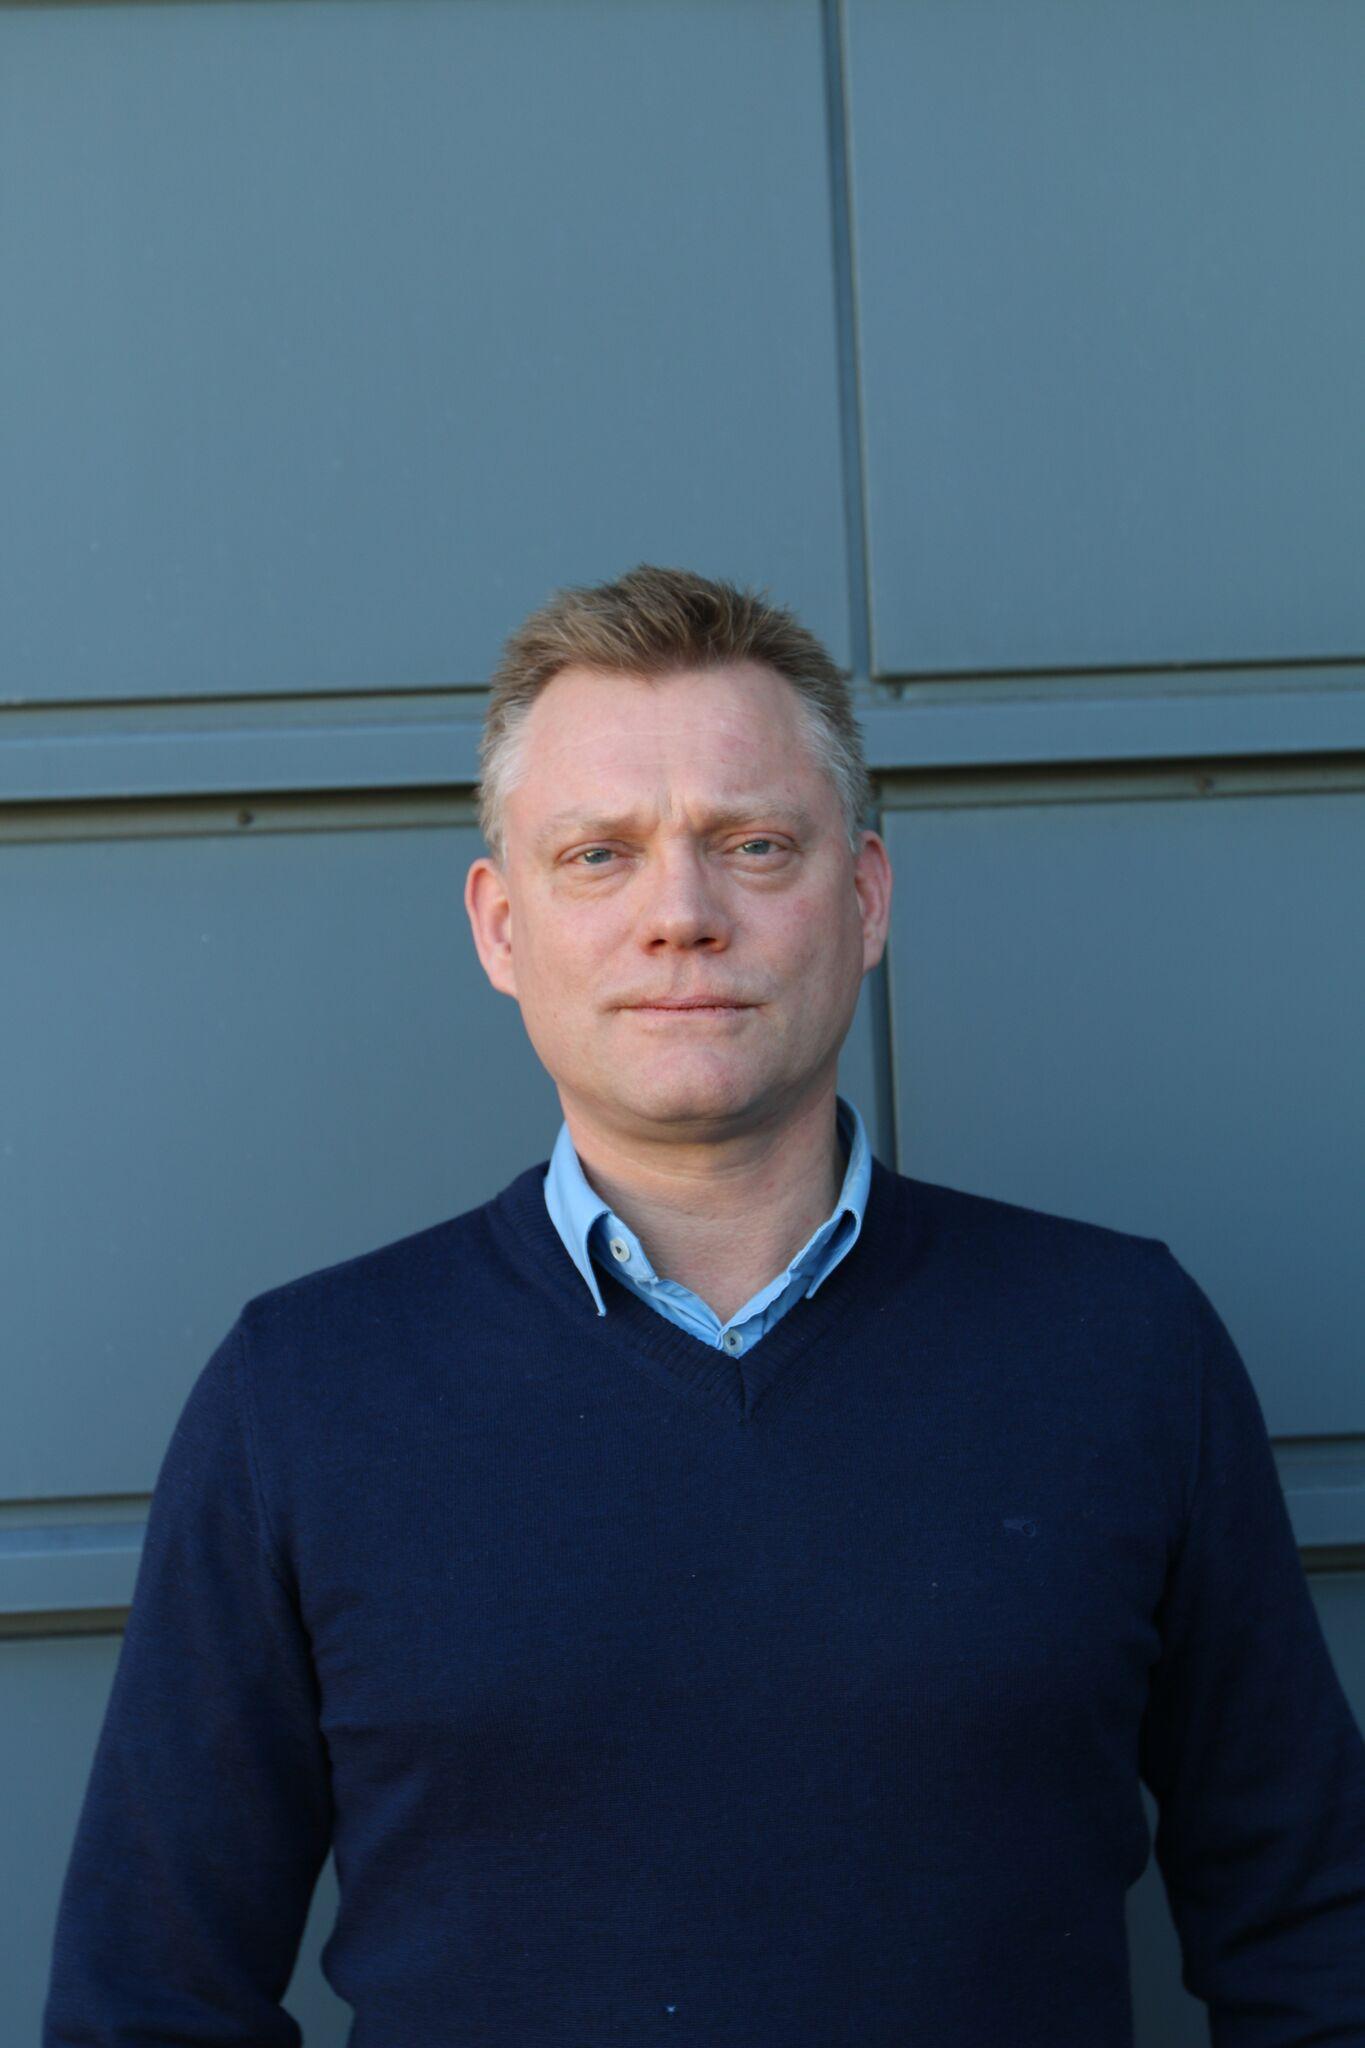 Frank Gjelsøy